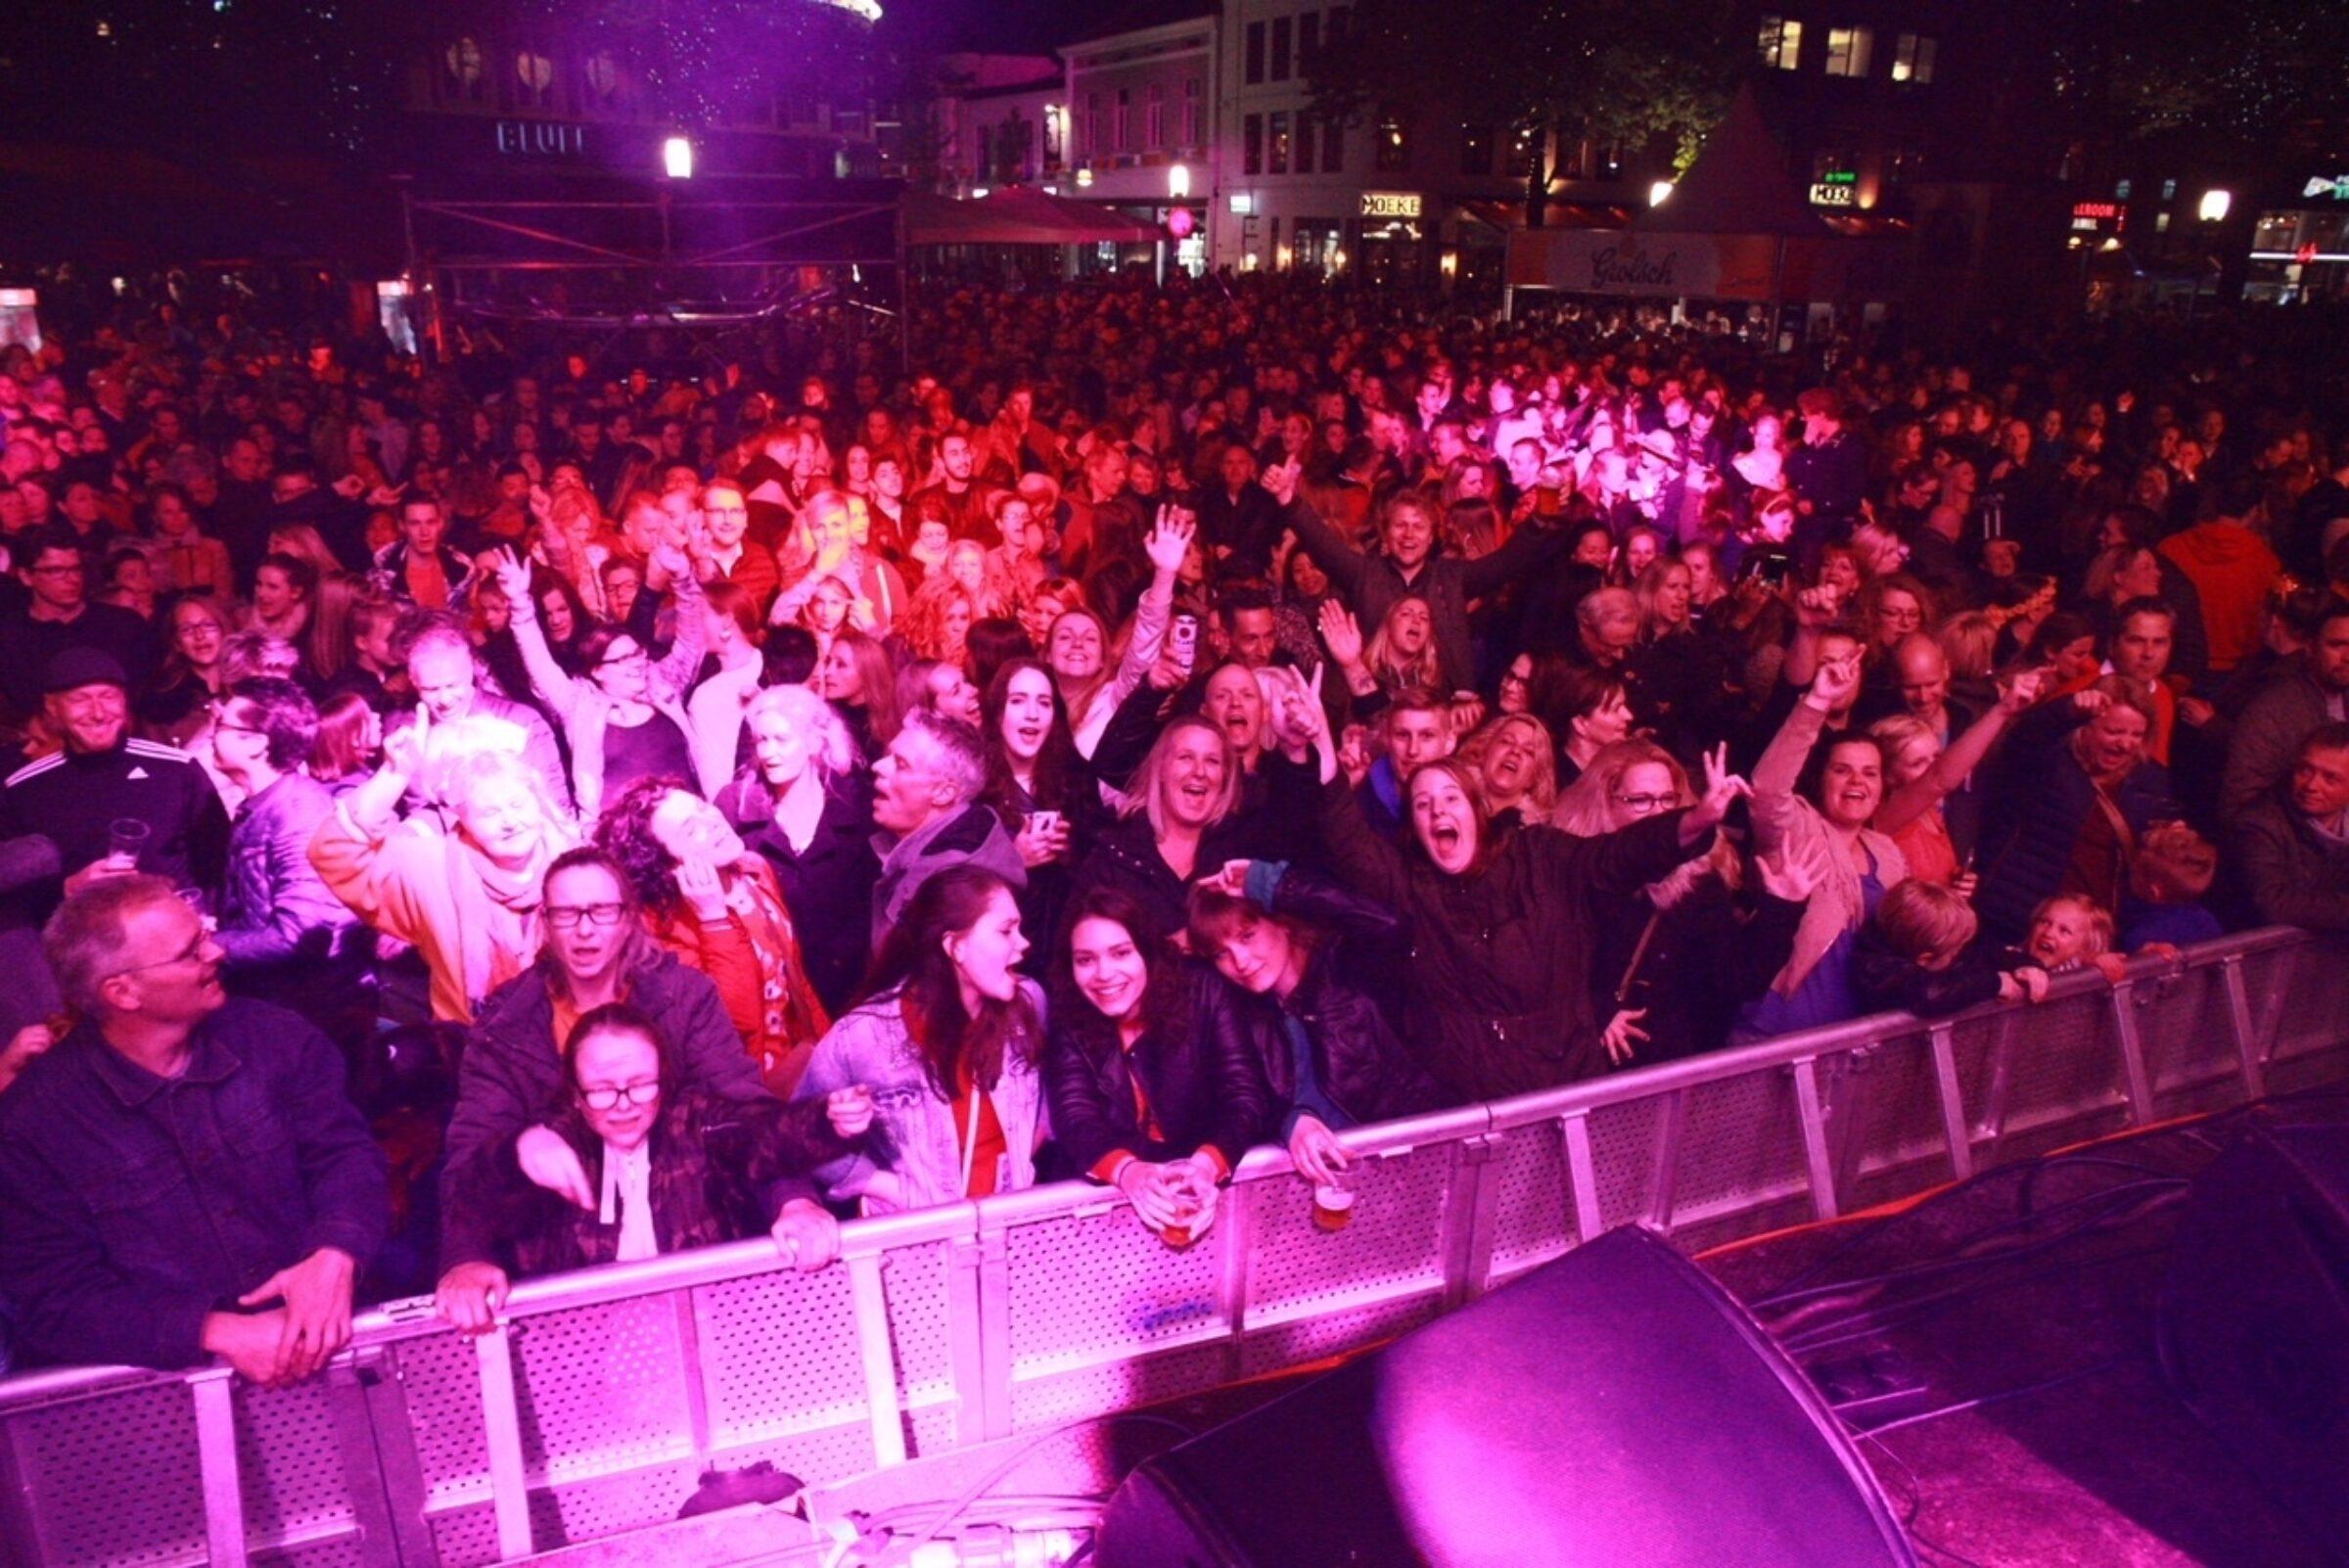 2018 Koningsfestival evenementen 2